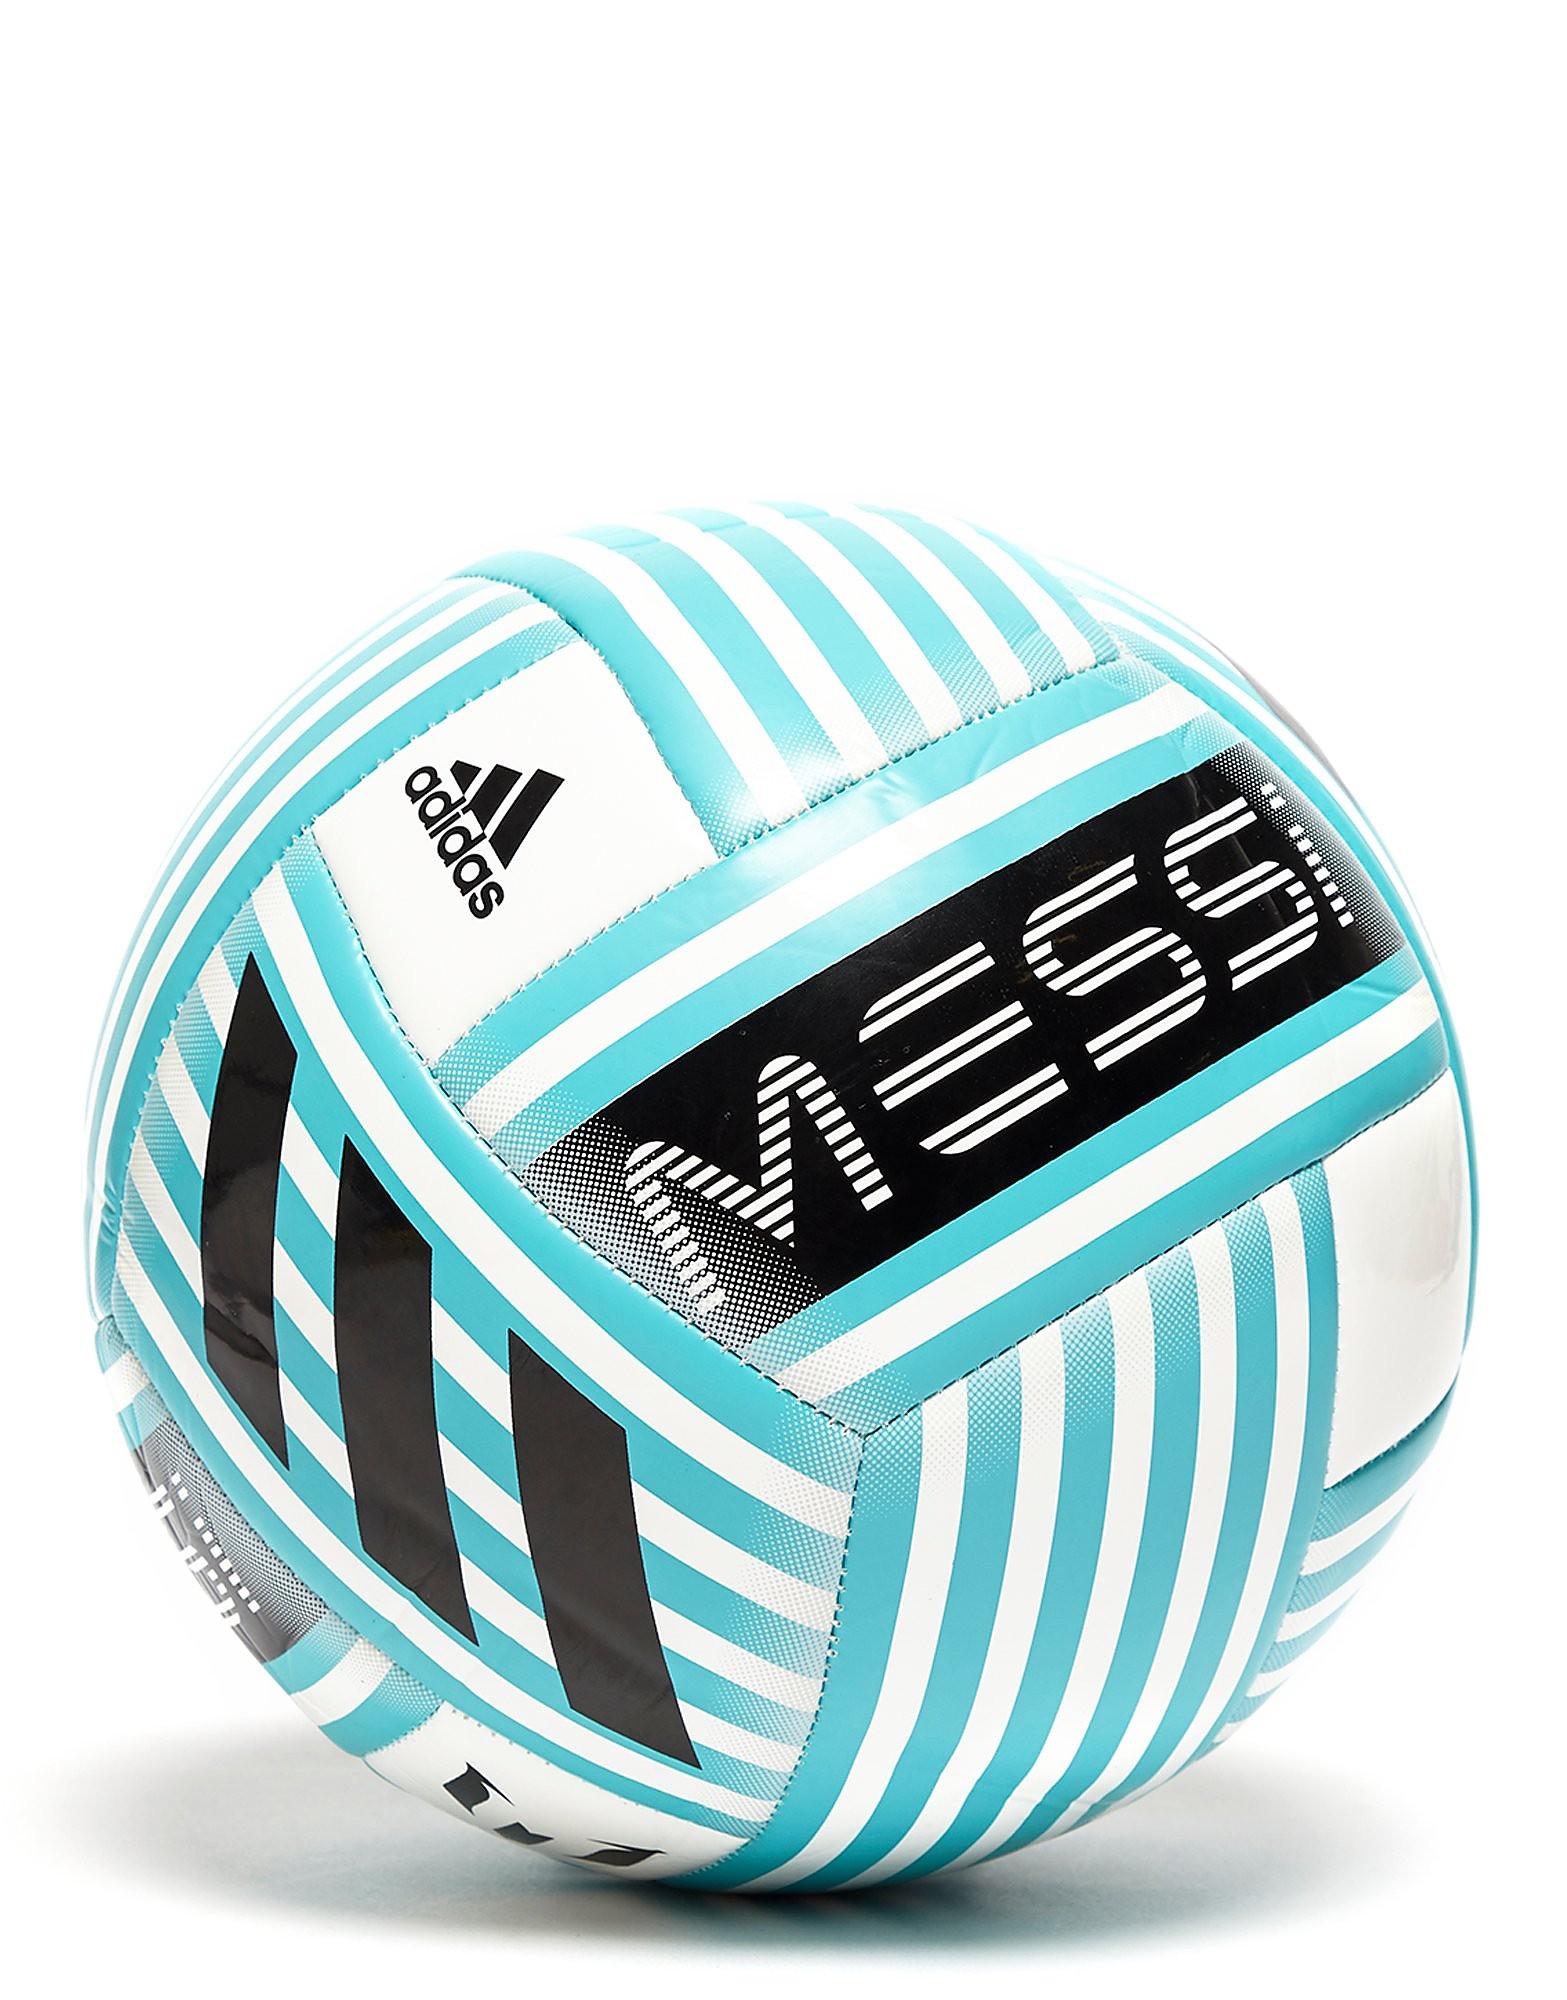 adidas Messi 10 Glider Football